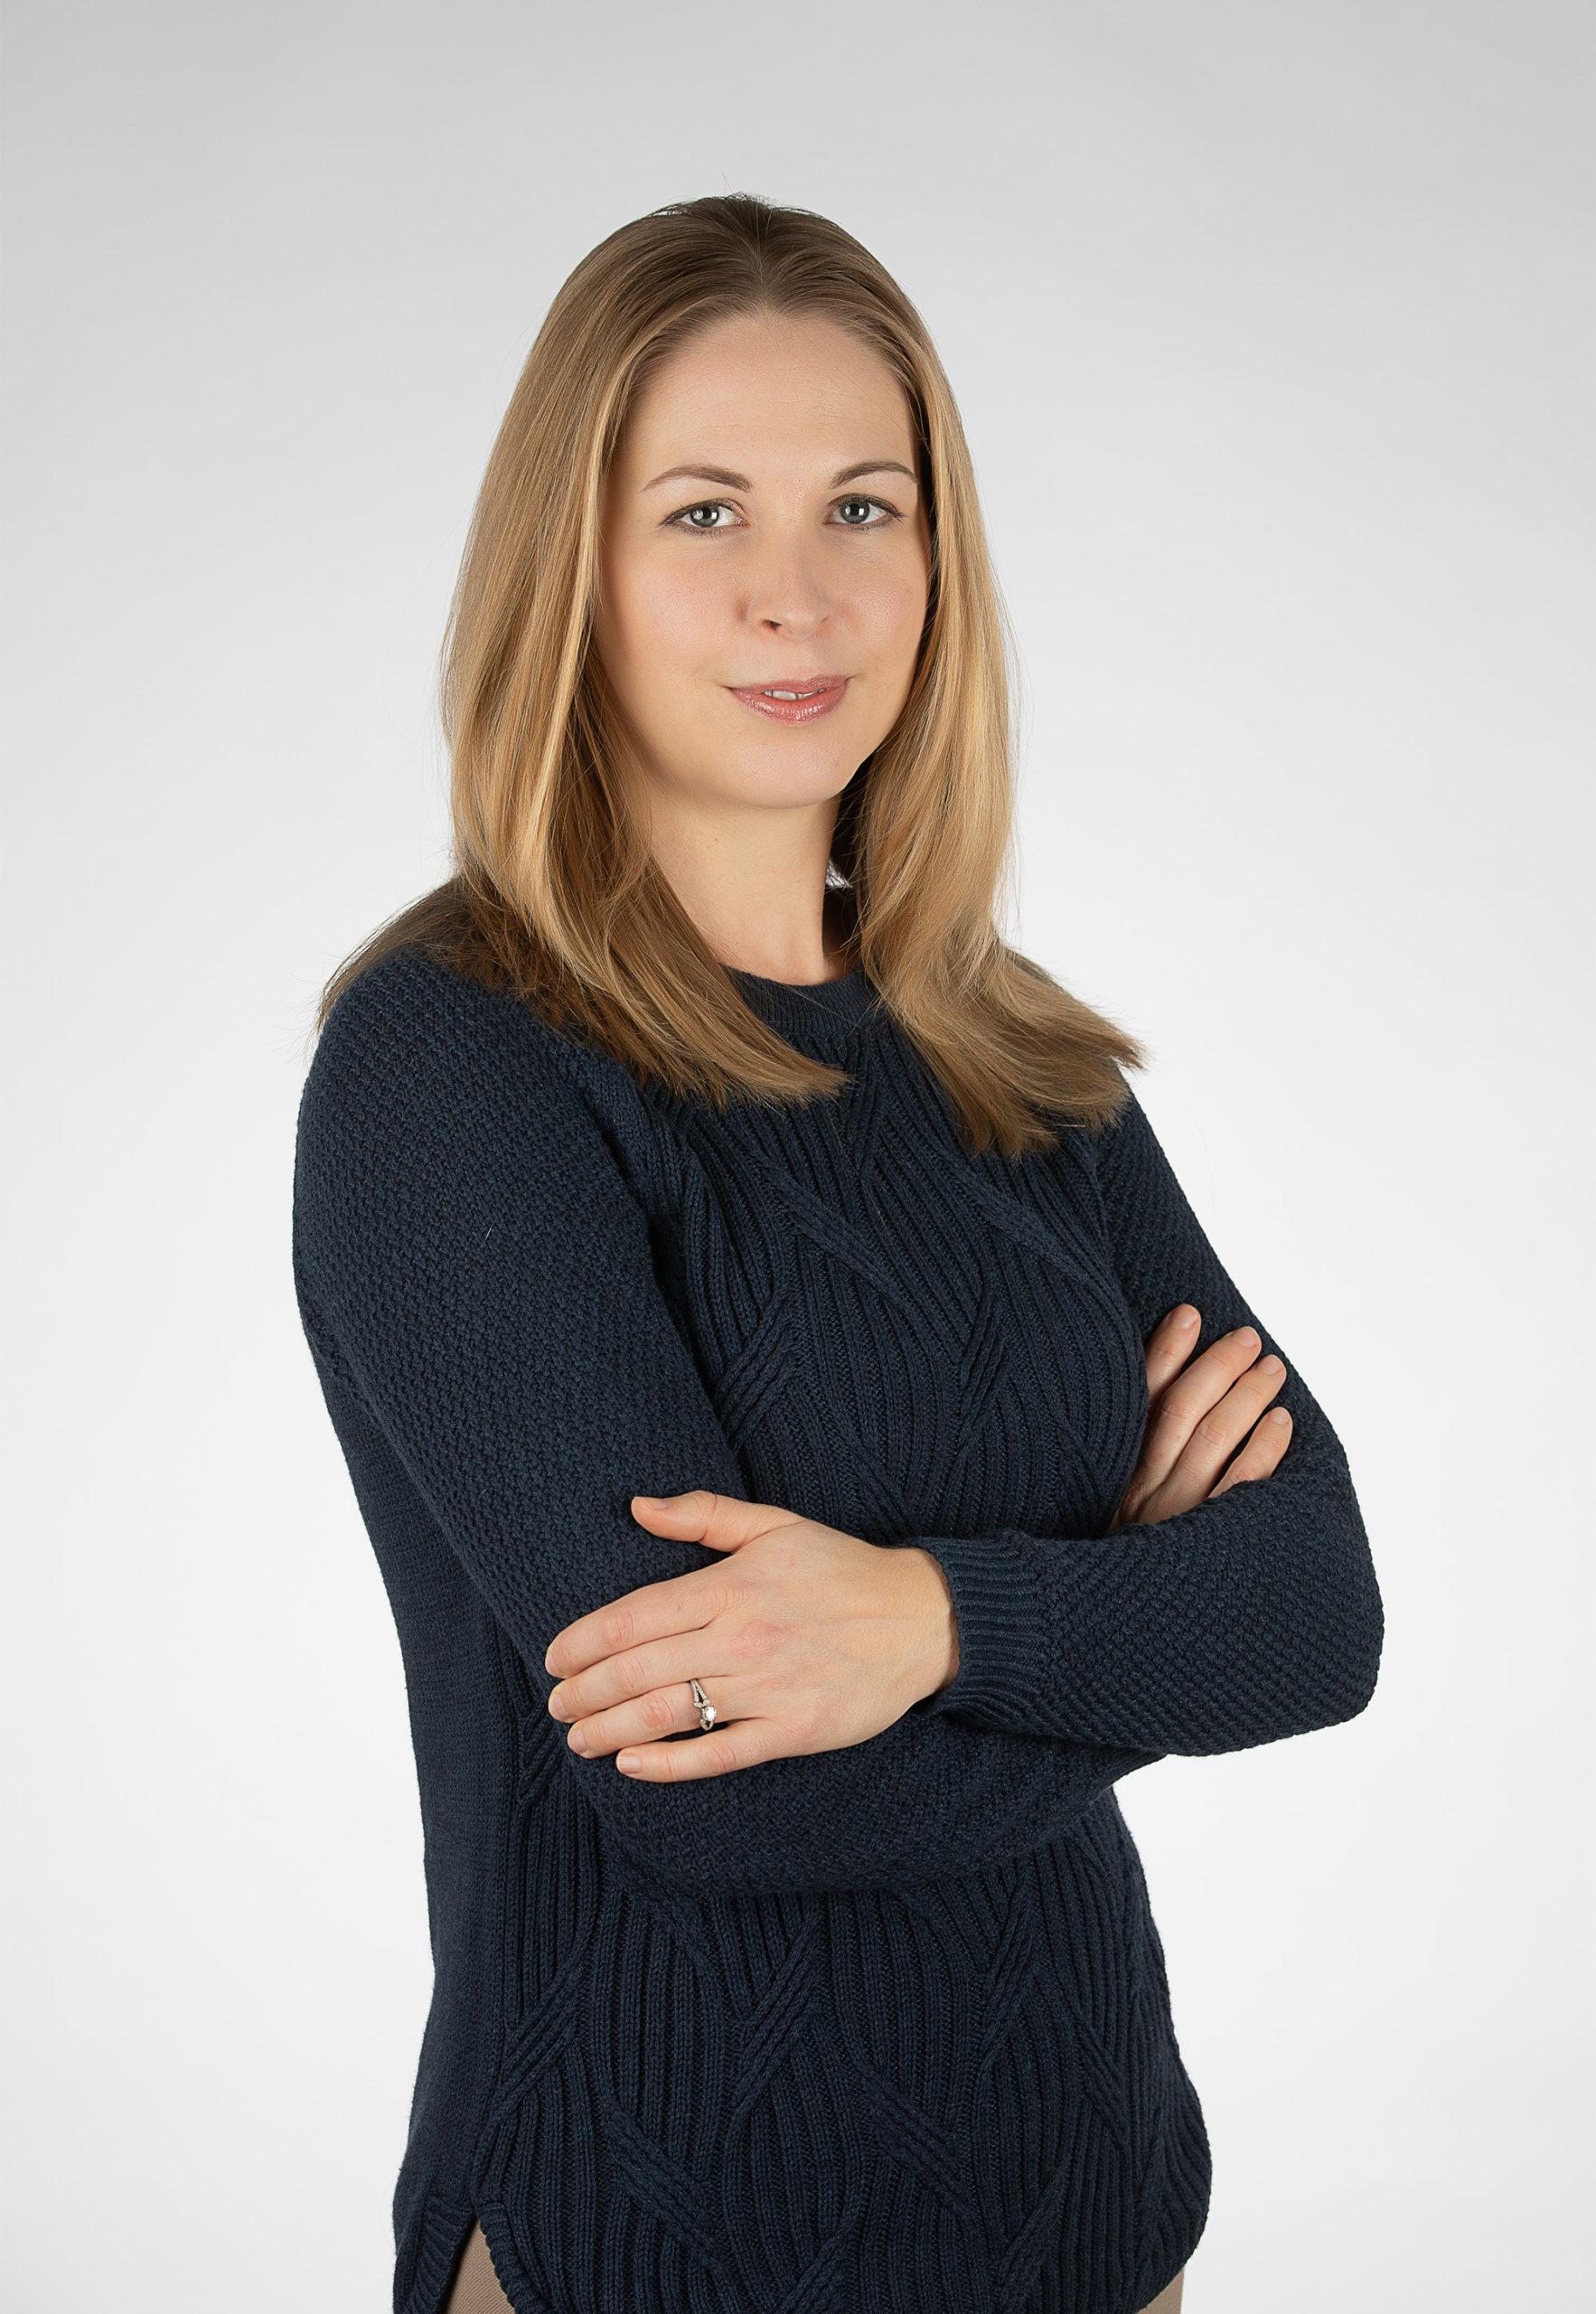 Erika Zink, FMCHC